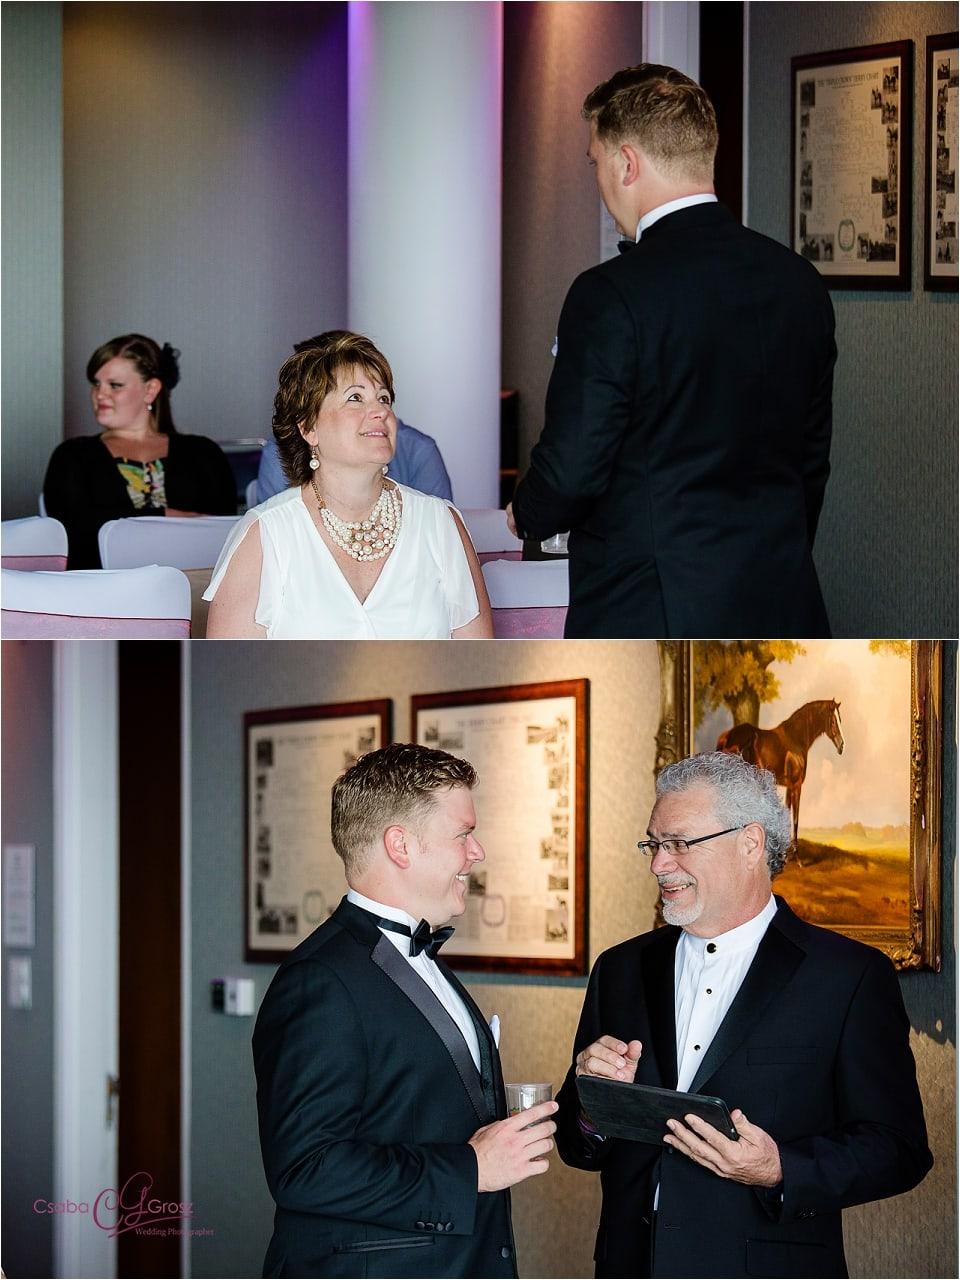 Parveen_Joseph_Wedding_at_Epsom_Downs_Wedding_Photographer_37